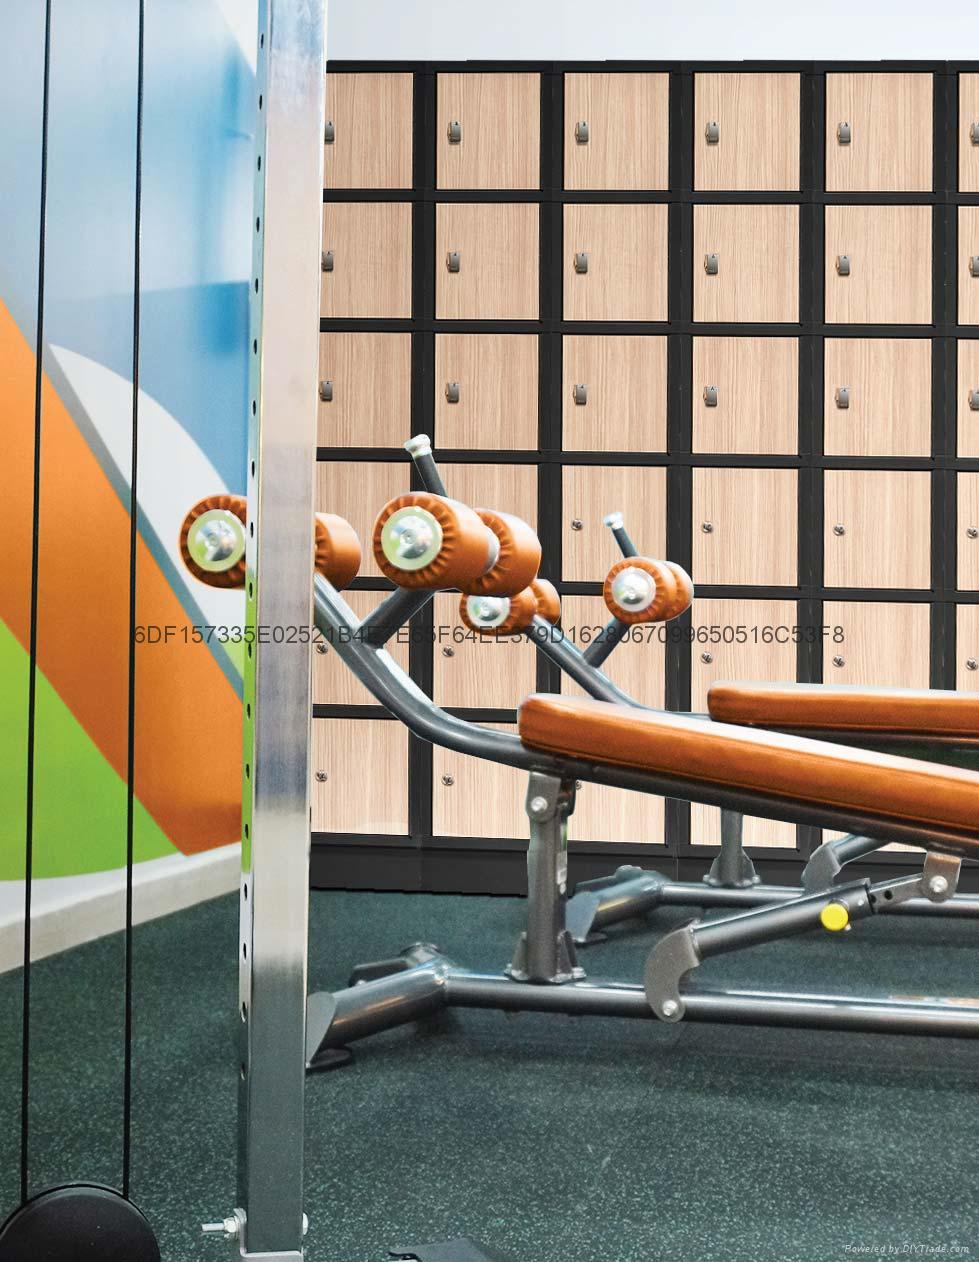 Digilock健身房专用感应式密码锁 5